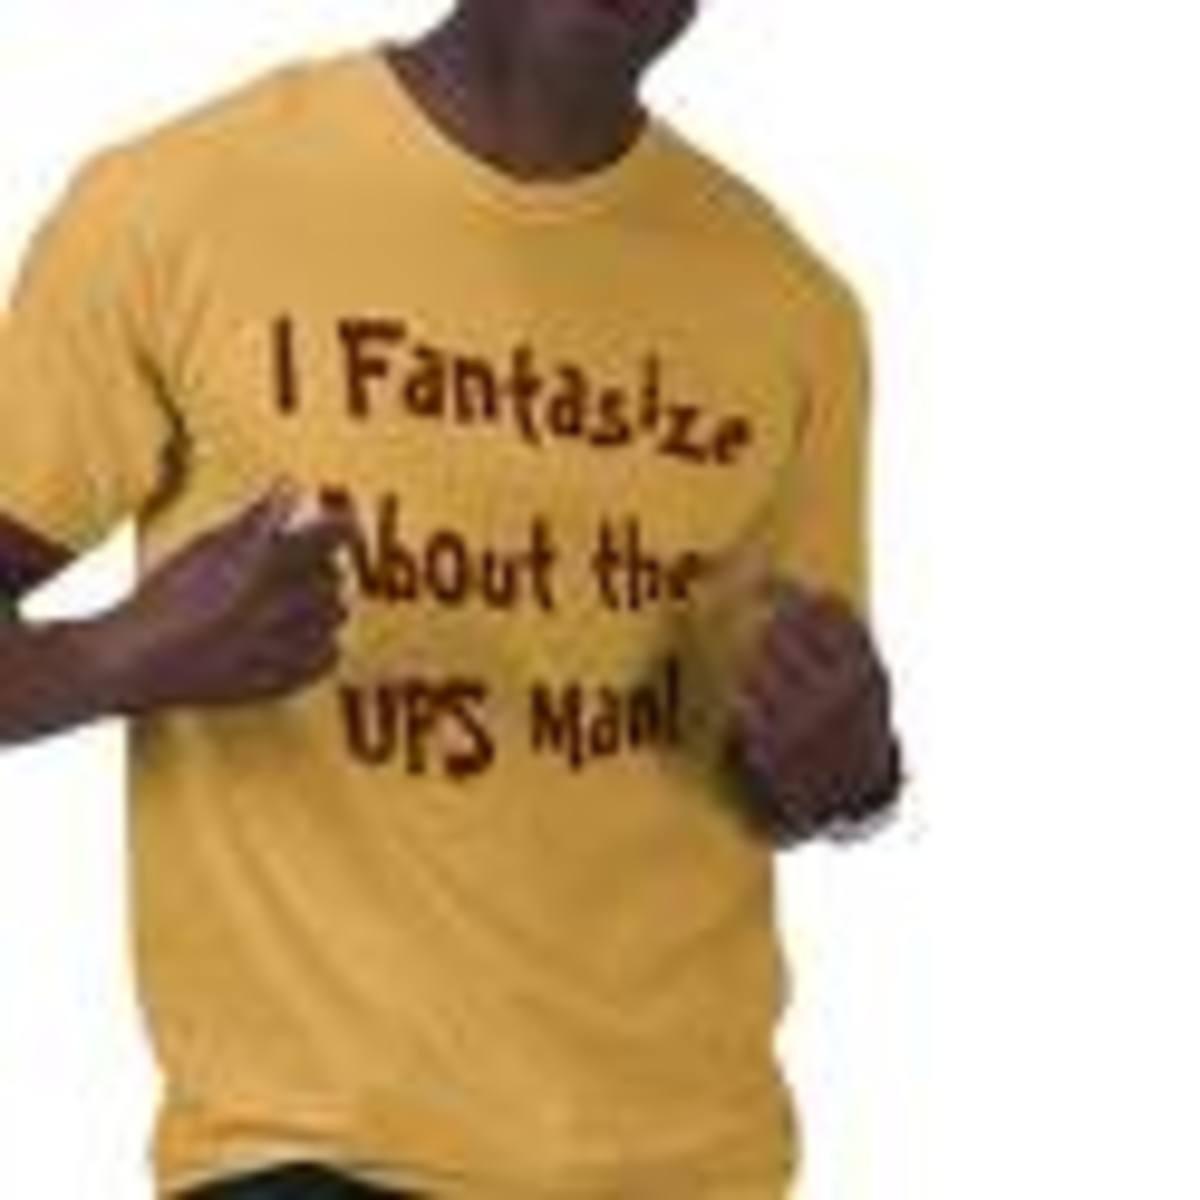 im-having-an-affair-with-the-ups-man